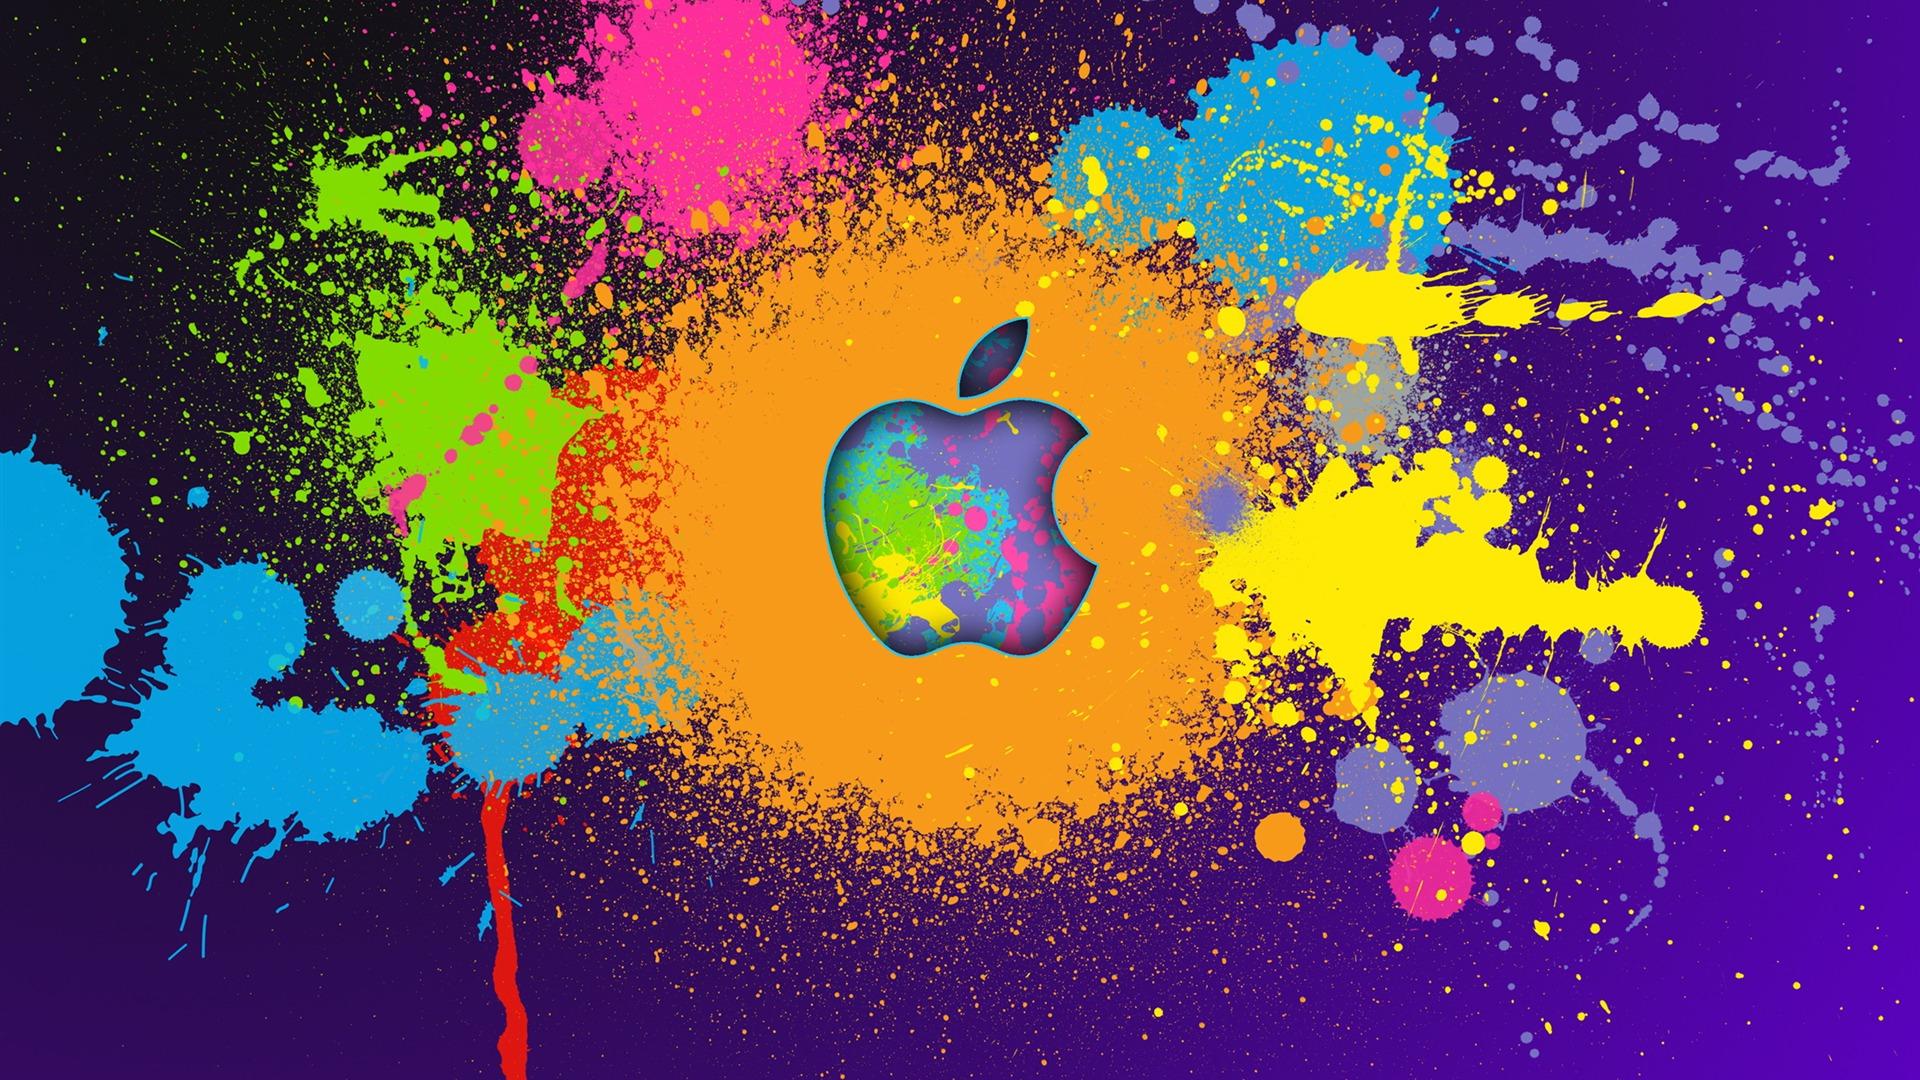 Apple Logo Wallpapers HD A23